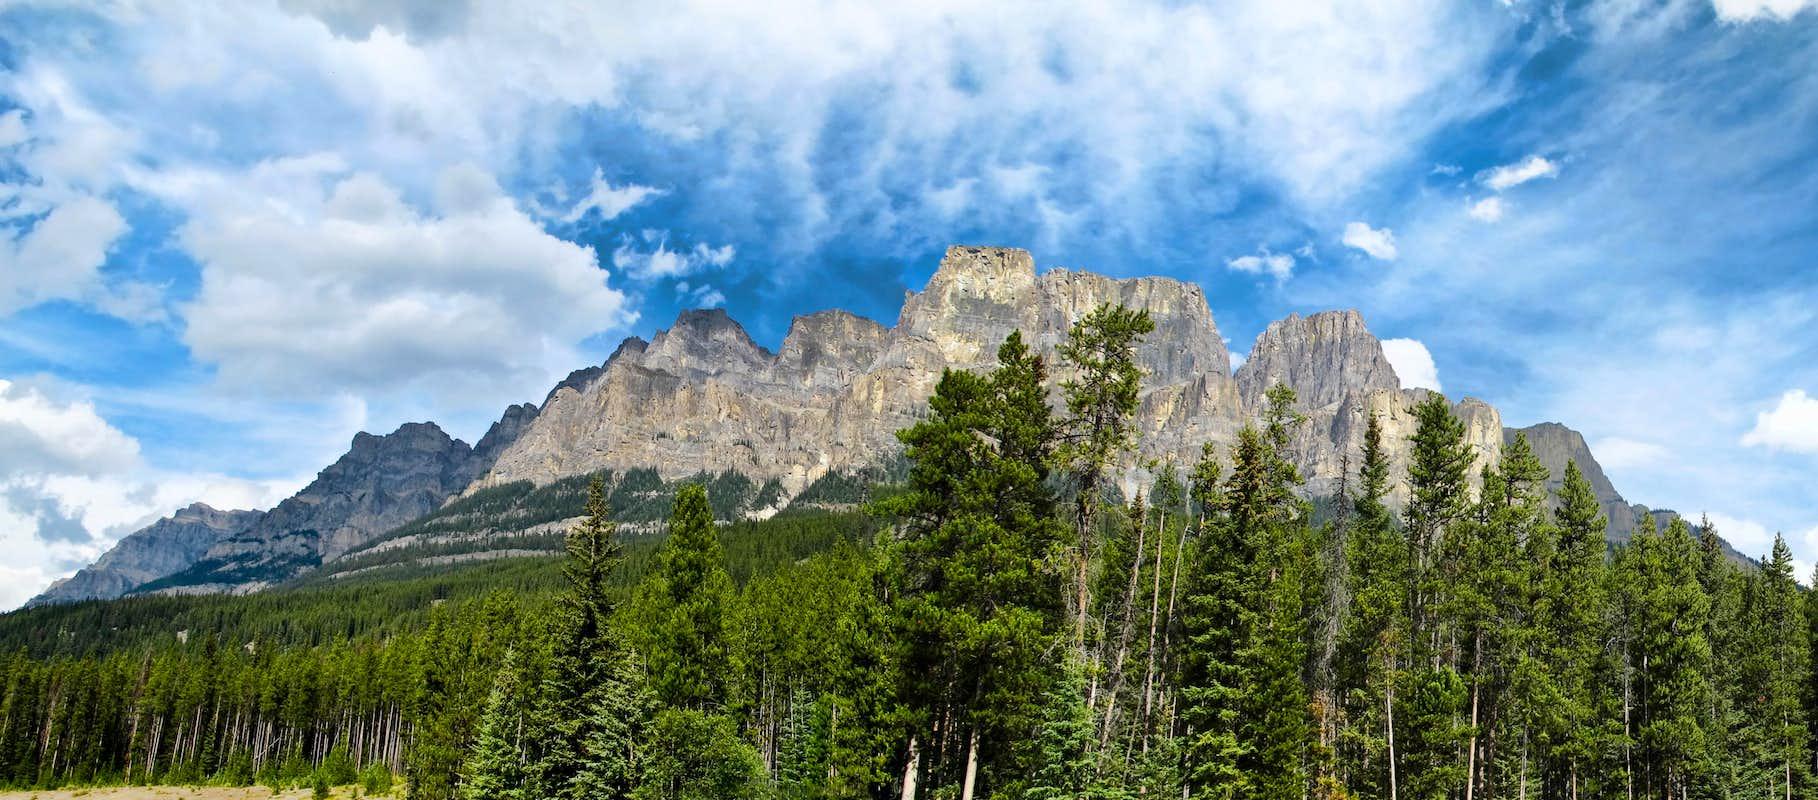 Castle Mtn Alberta Panorama Photos Diagrams Amp Topos Summitpost